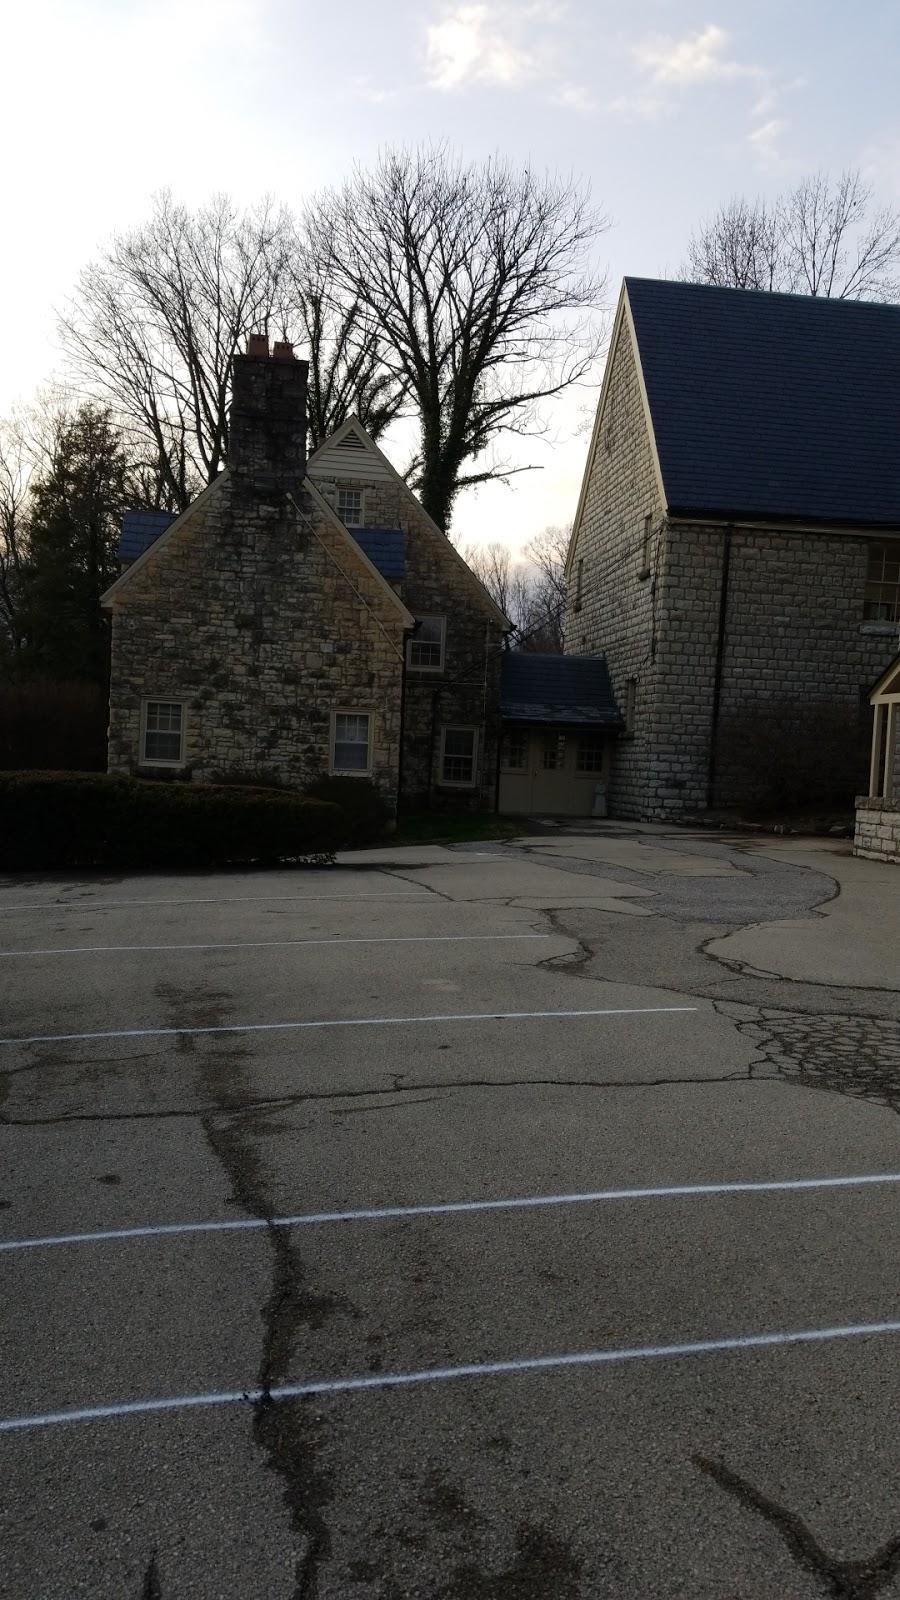 St Lukes Episcopal Church - church  | Photo 7 of 10 | Address: 1206 Maple Ln, Louisville, KY 40223, USA | Phone: (502) 245-8827